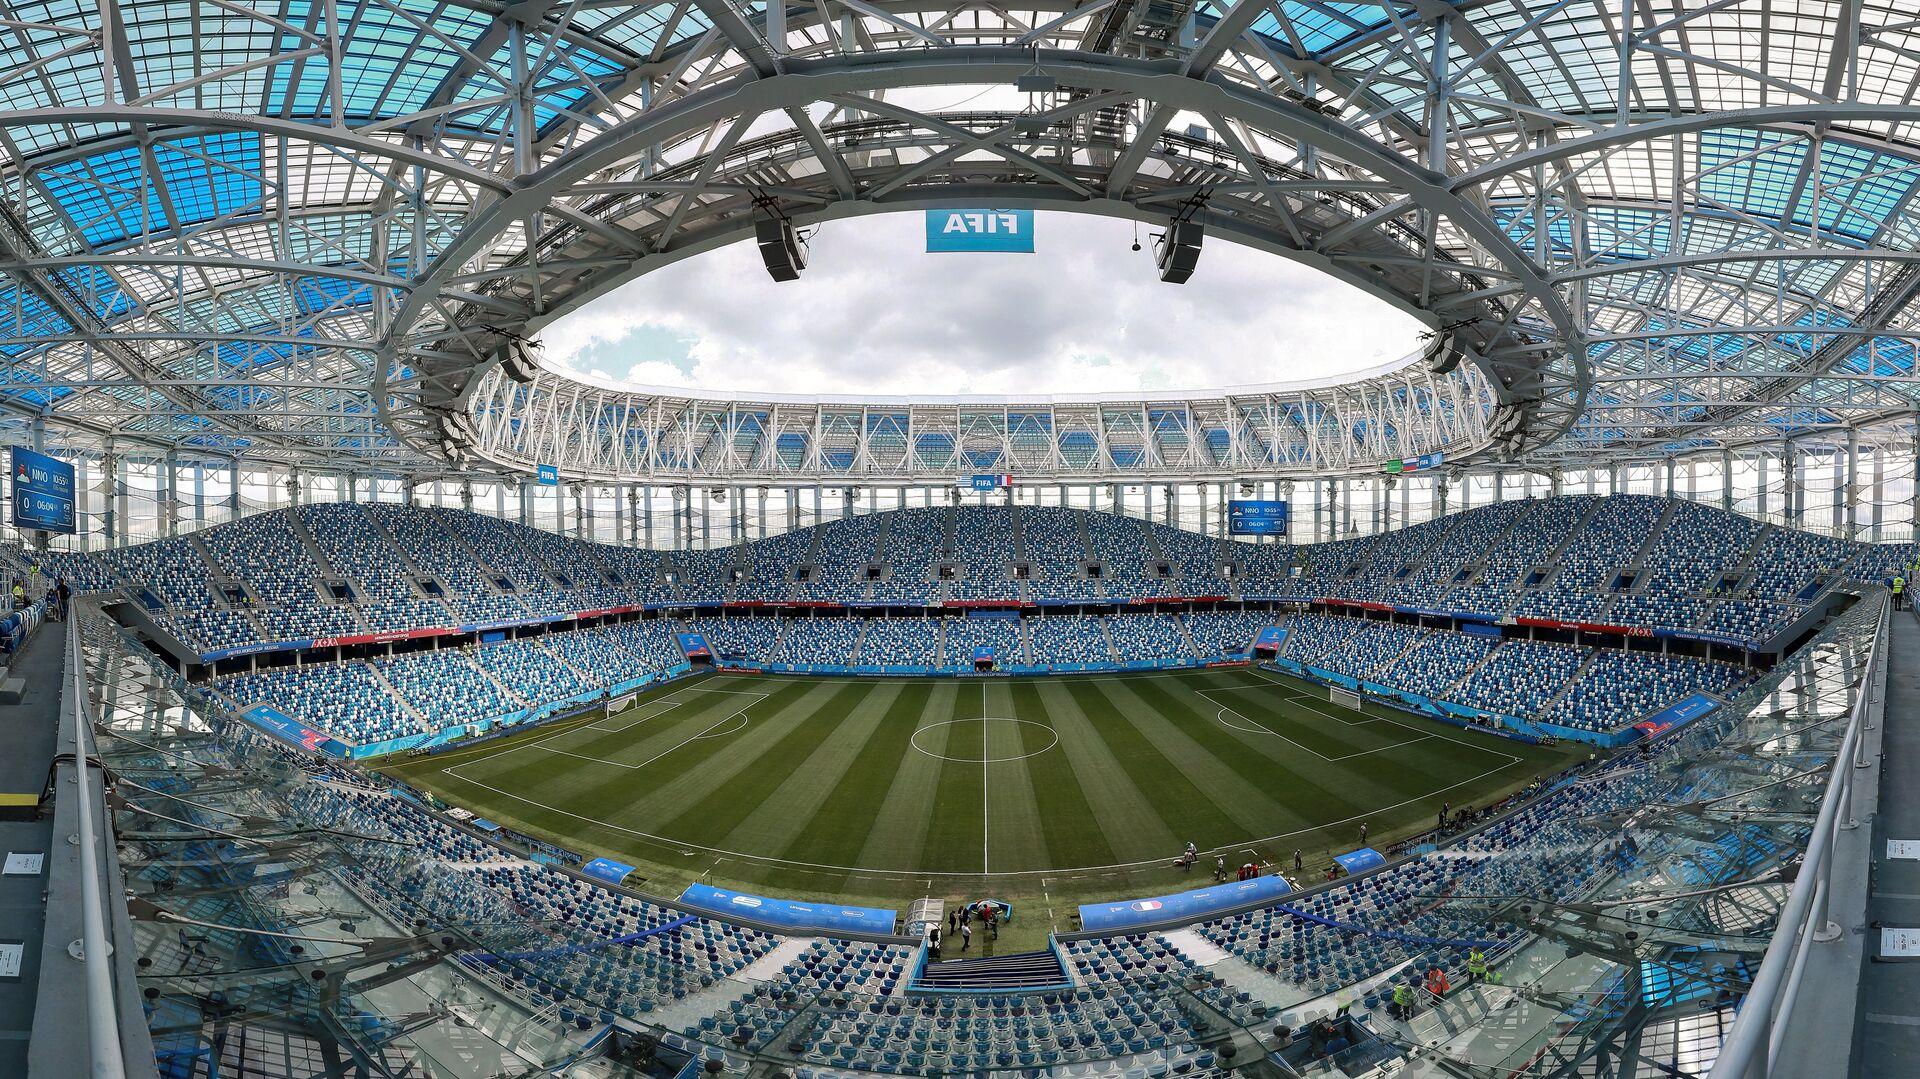 Стадион Нижний Новгород - РИА Новости, 1920, 10.07.2021